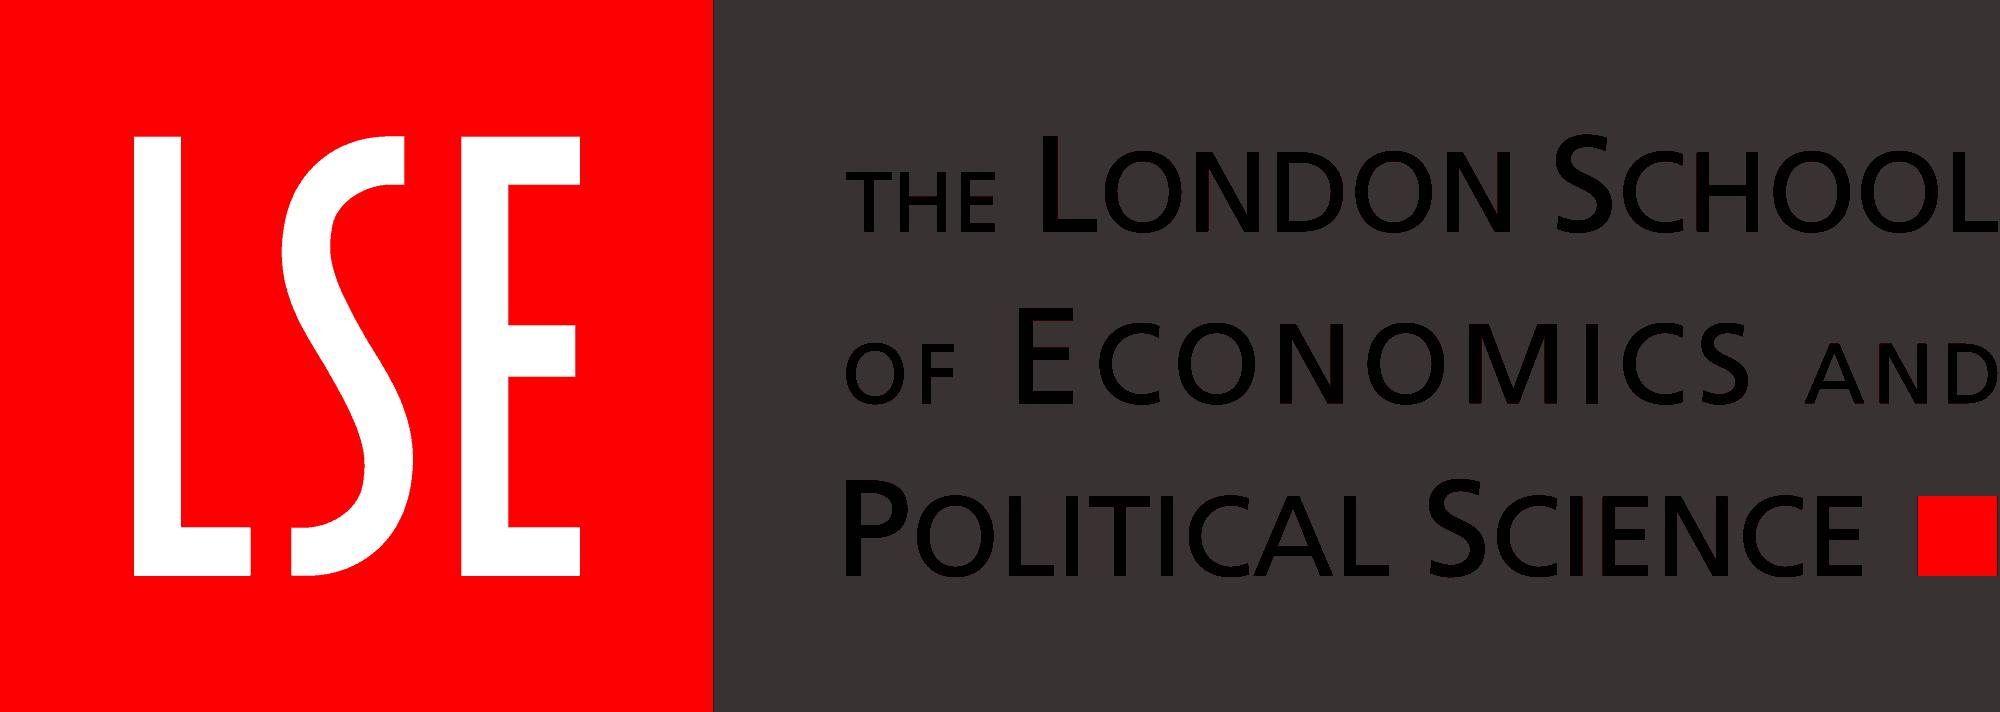 london-school-of-economics-logo.png